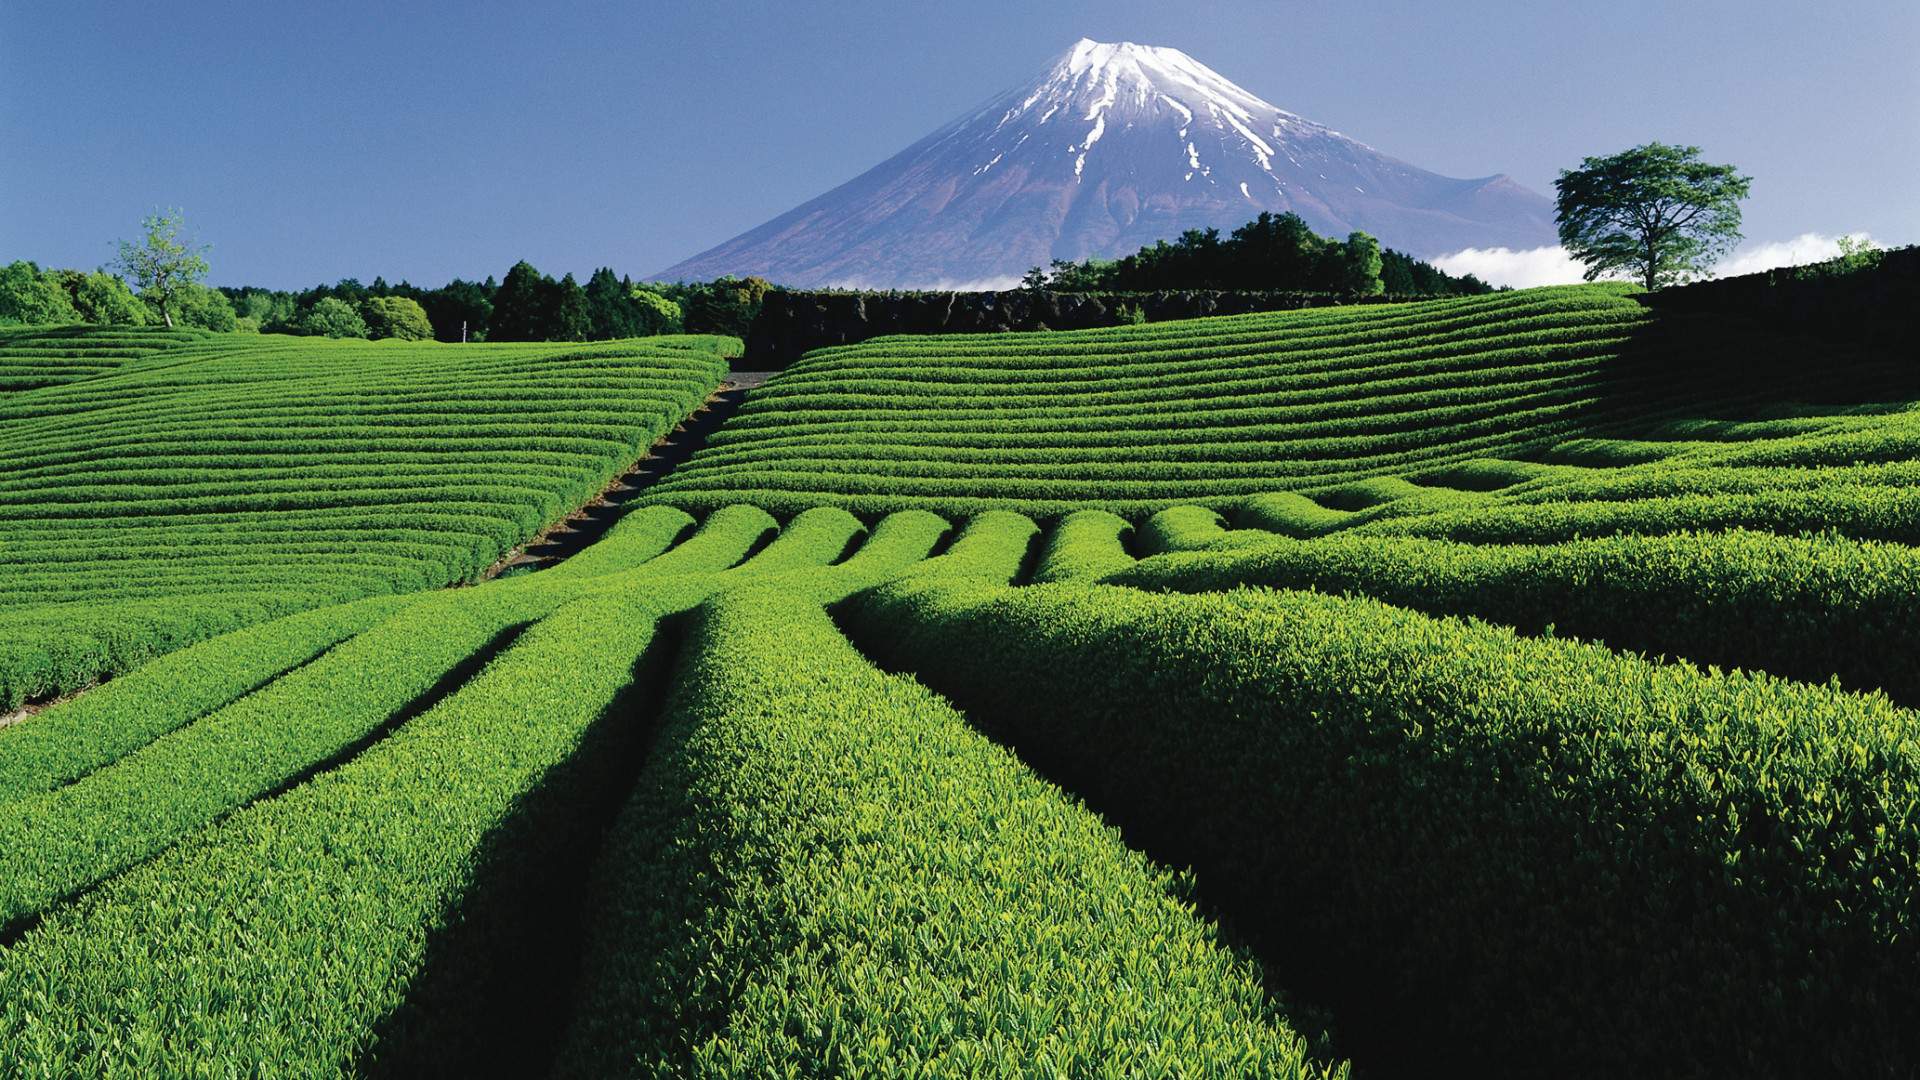 Japan Rugby World Cup 2019: Mt Fuji and the Shizuoka Tea fields